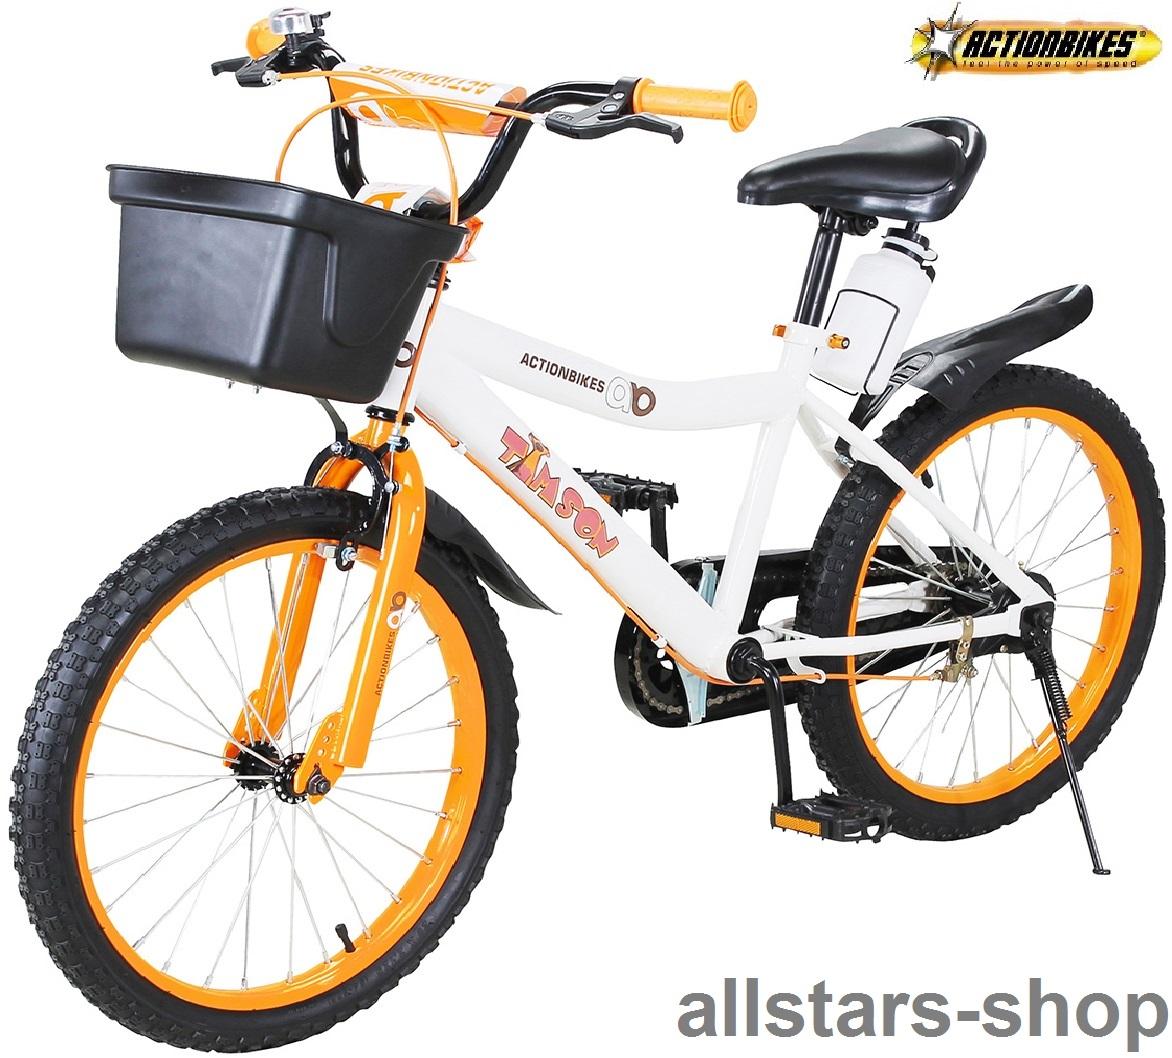 actionbikes kinderfahrrad kinder fahrrad timson 20. Black Bedroom Furniture Sets. Home Design Ideas